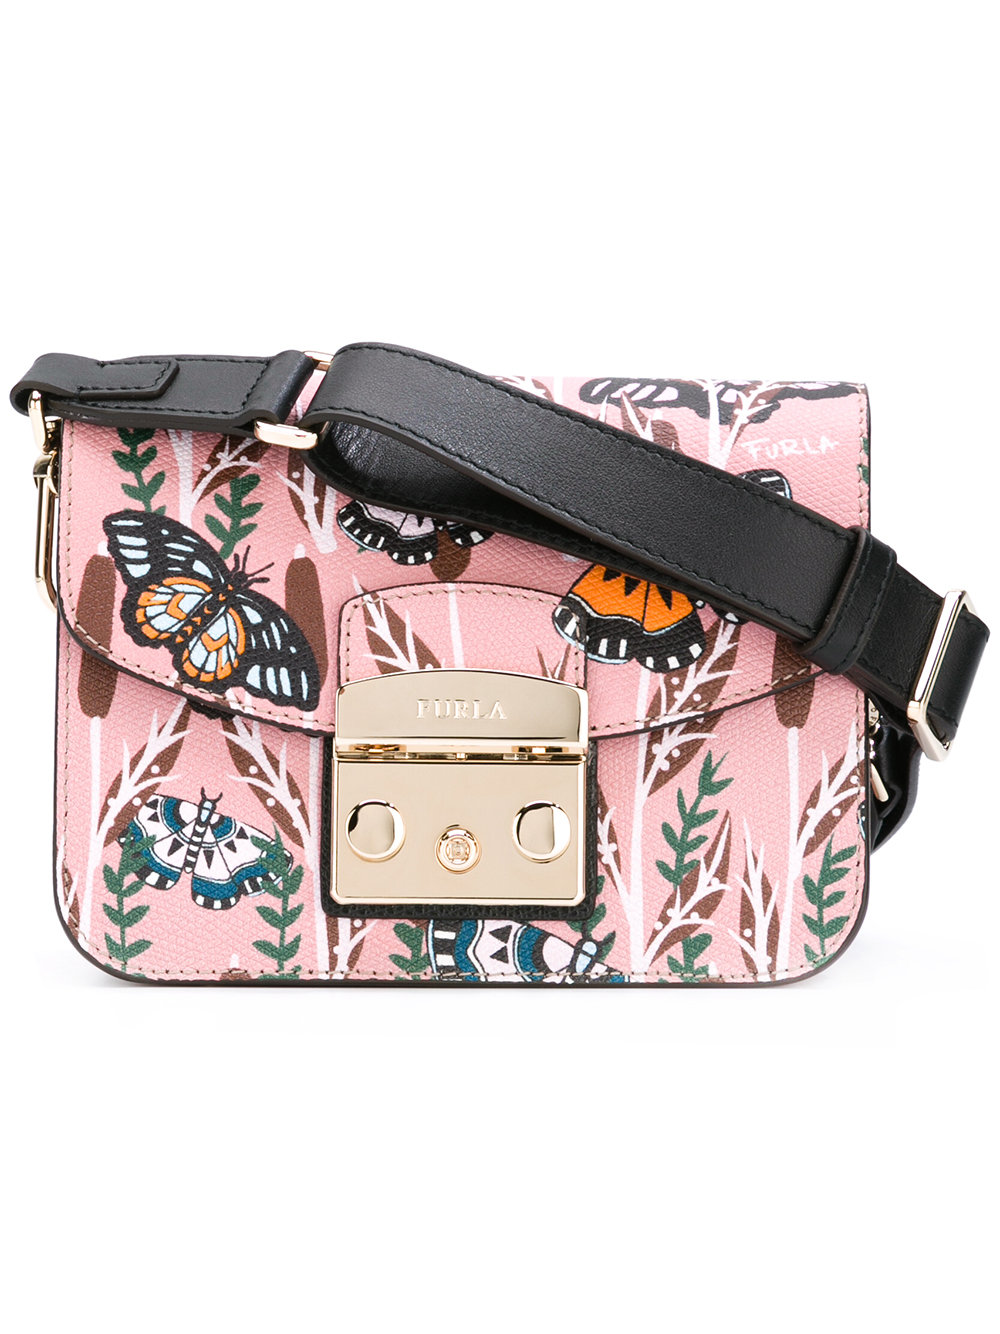 FURLA cross body bag - $380